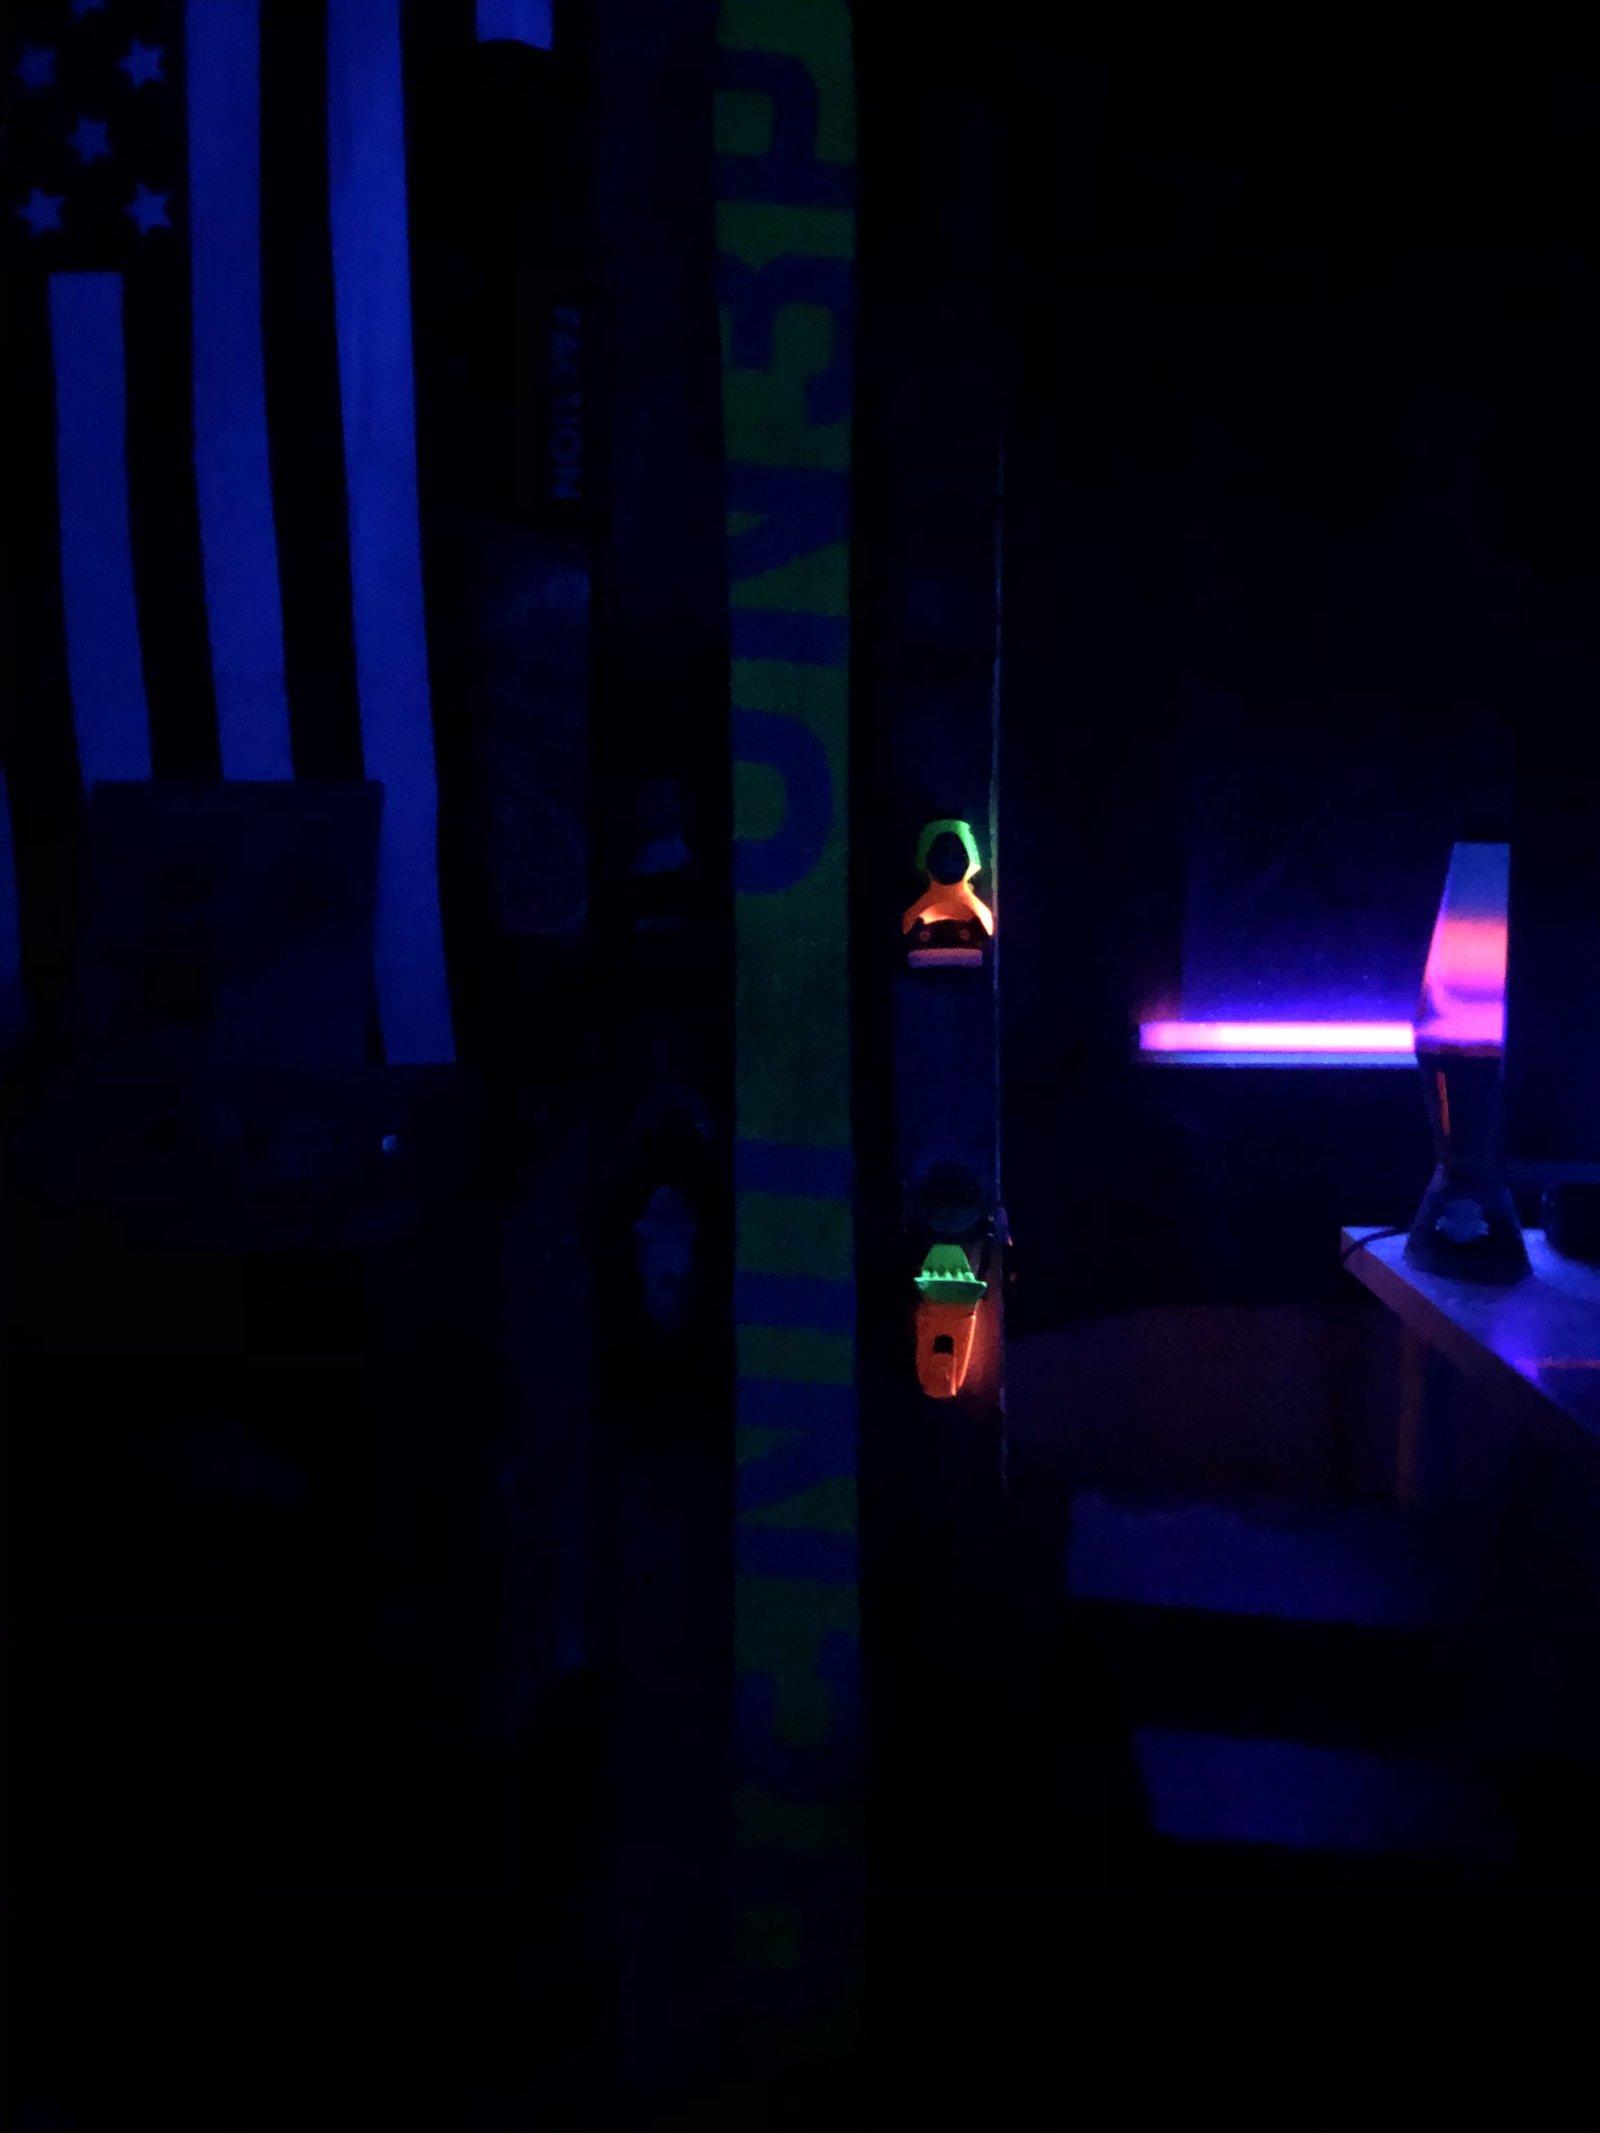 Who knew pivots glow in the dark?